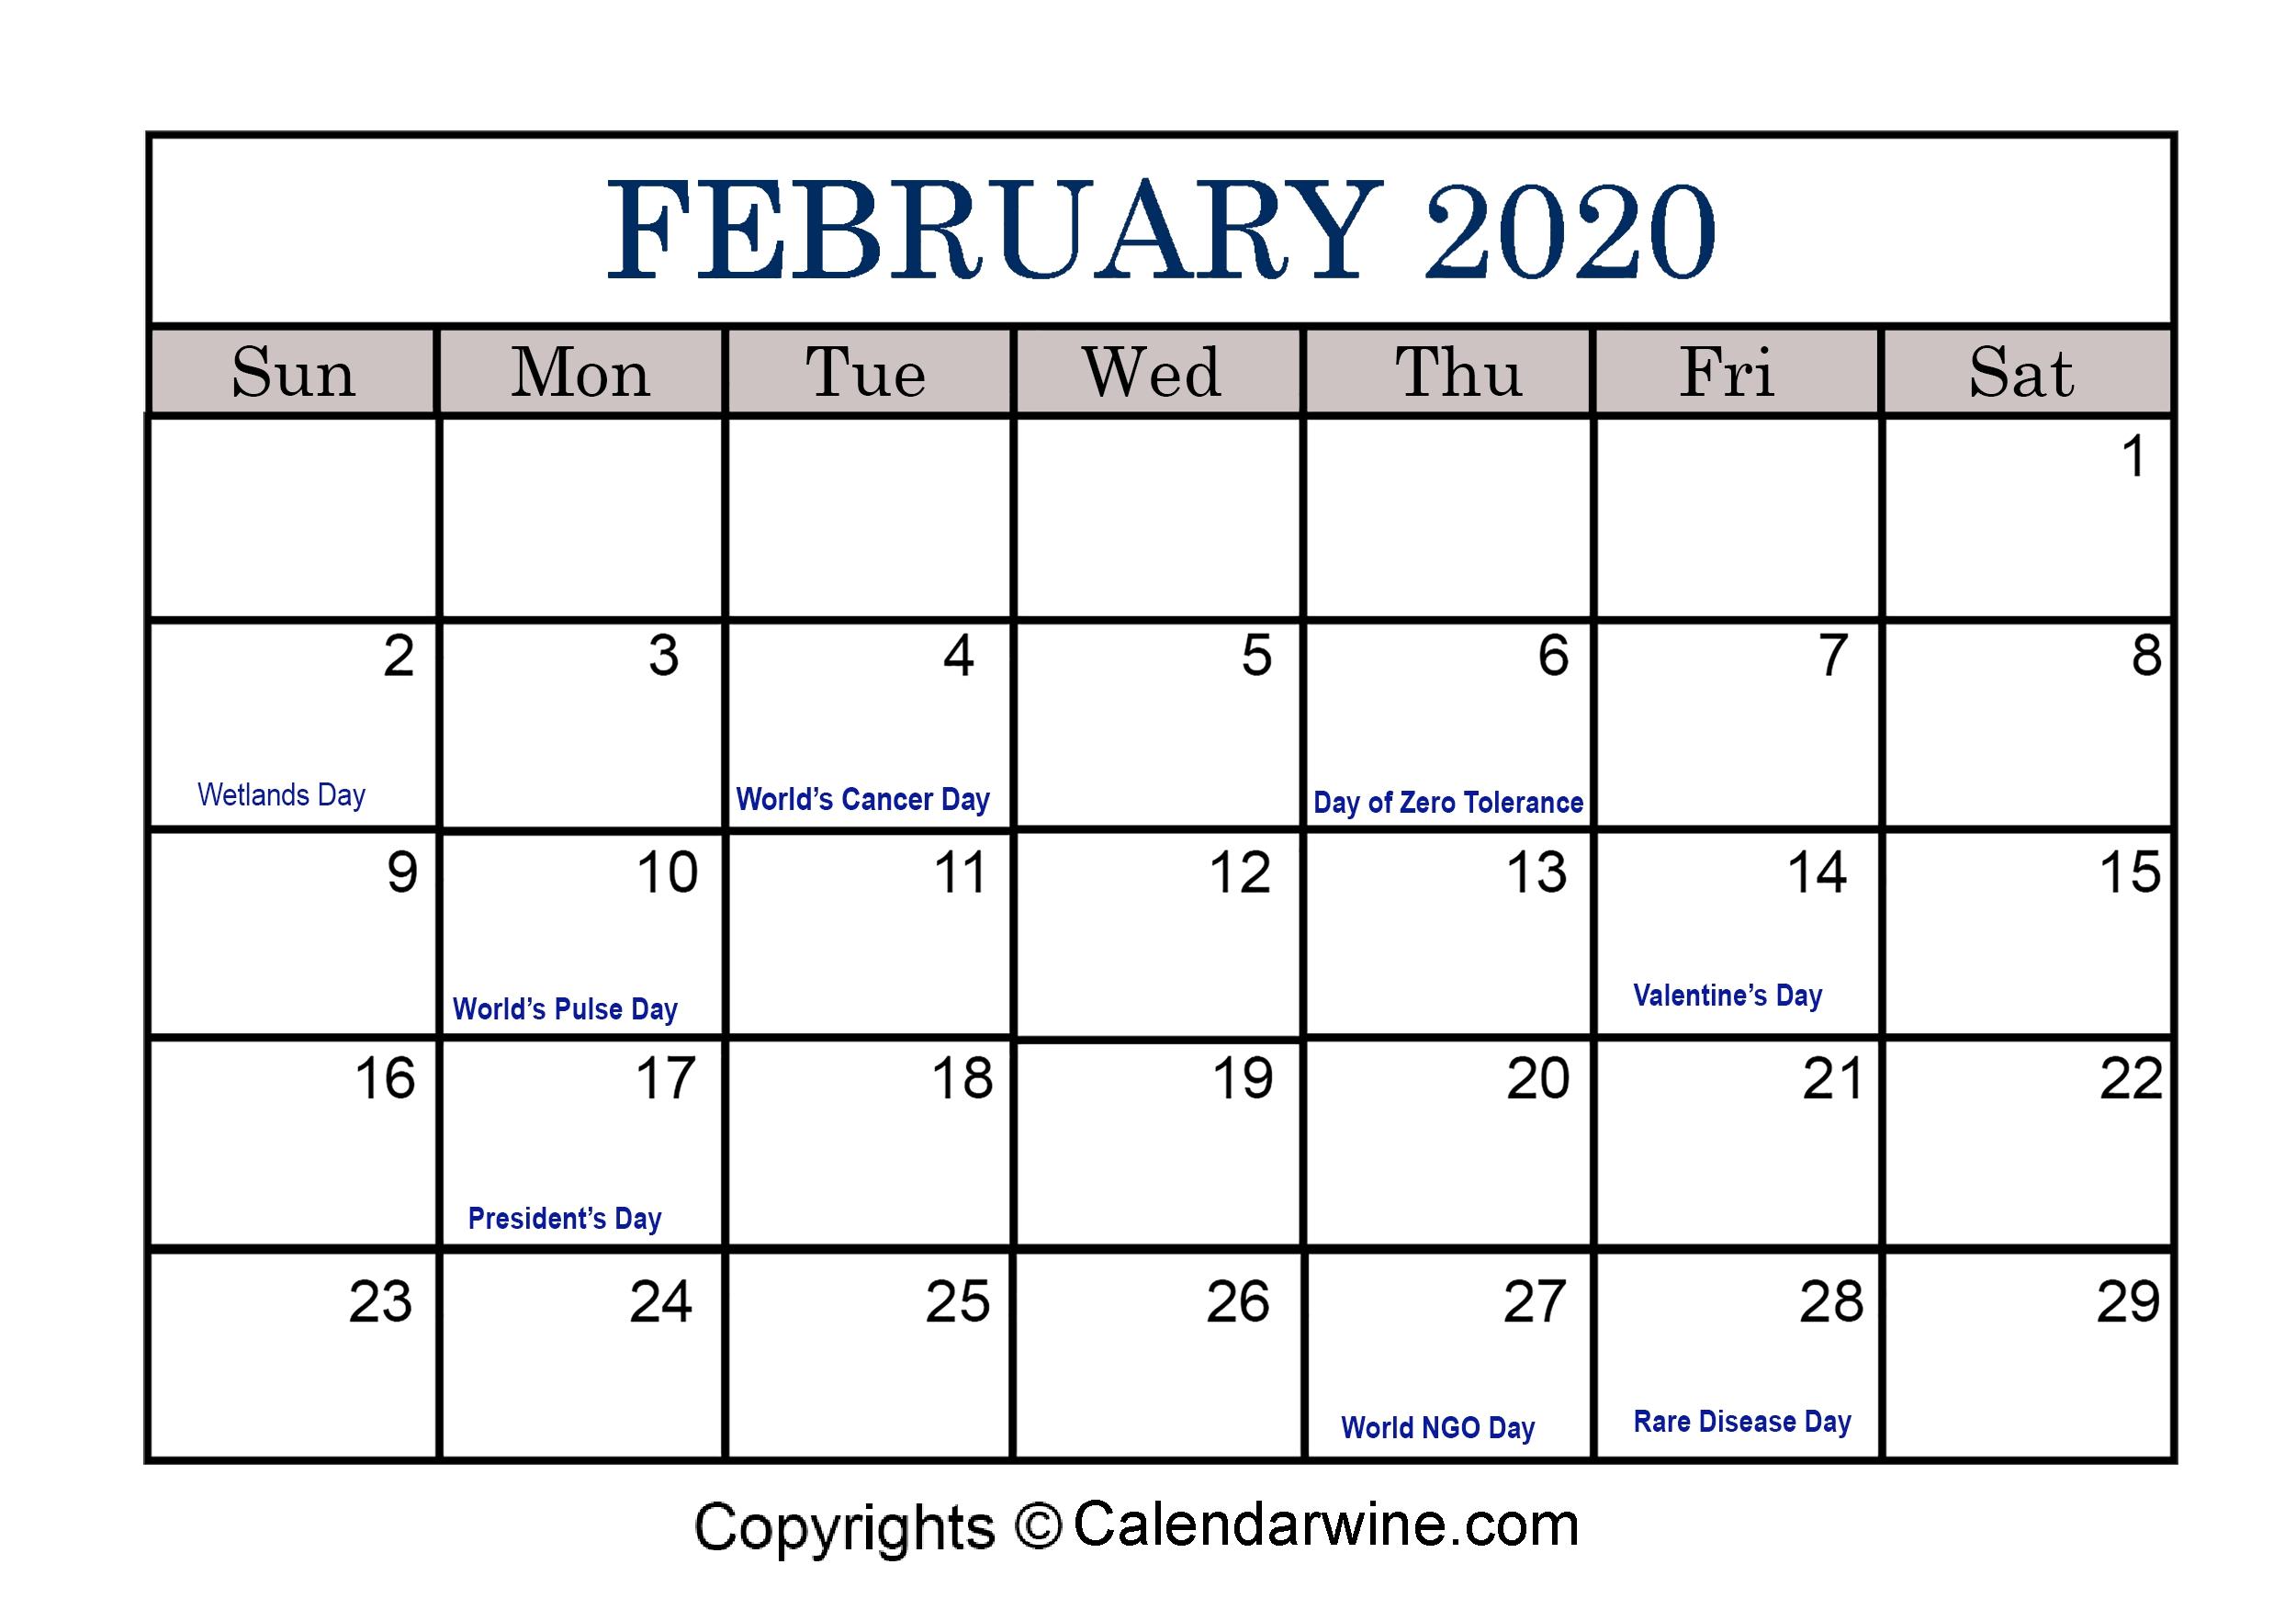 Full List Of February Holidays 2020 For Usa Uk Canada-2020 Calendar With Jewish Holidays Printable